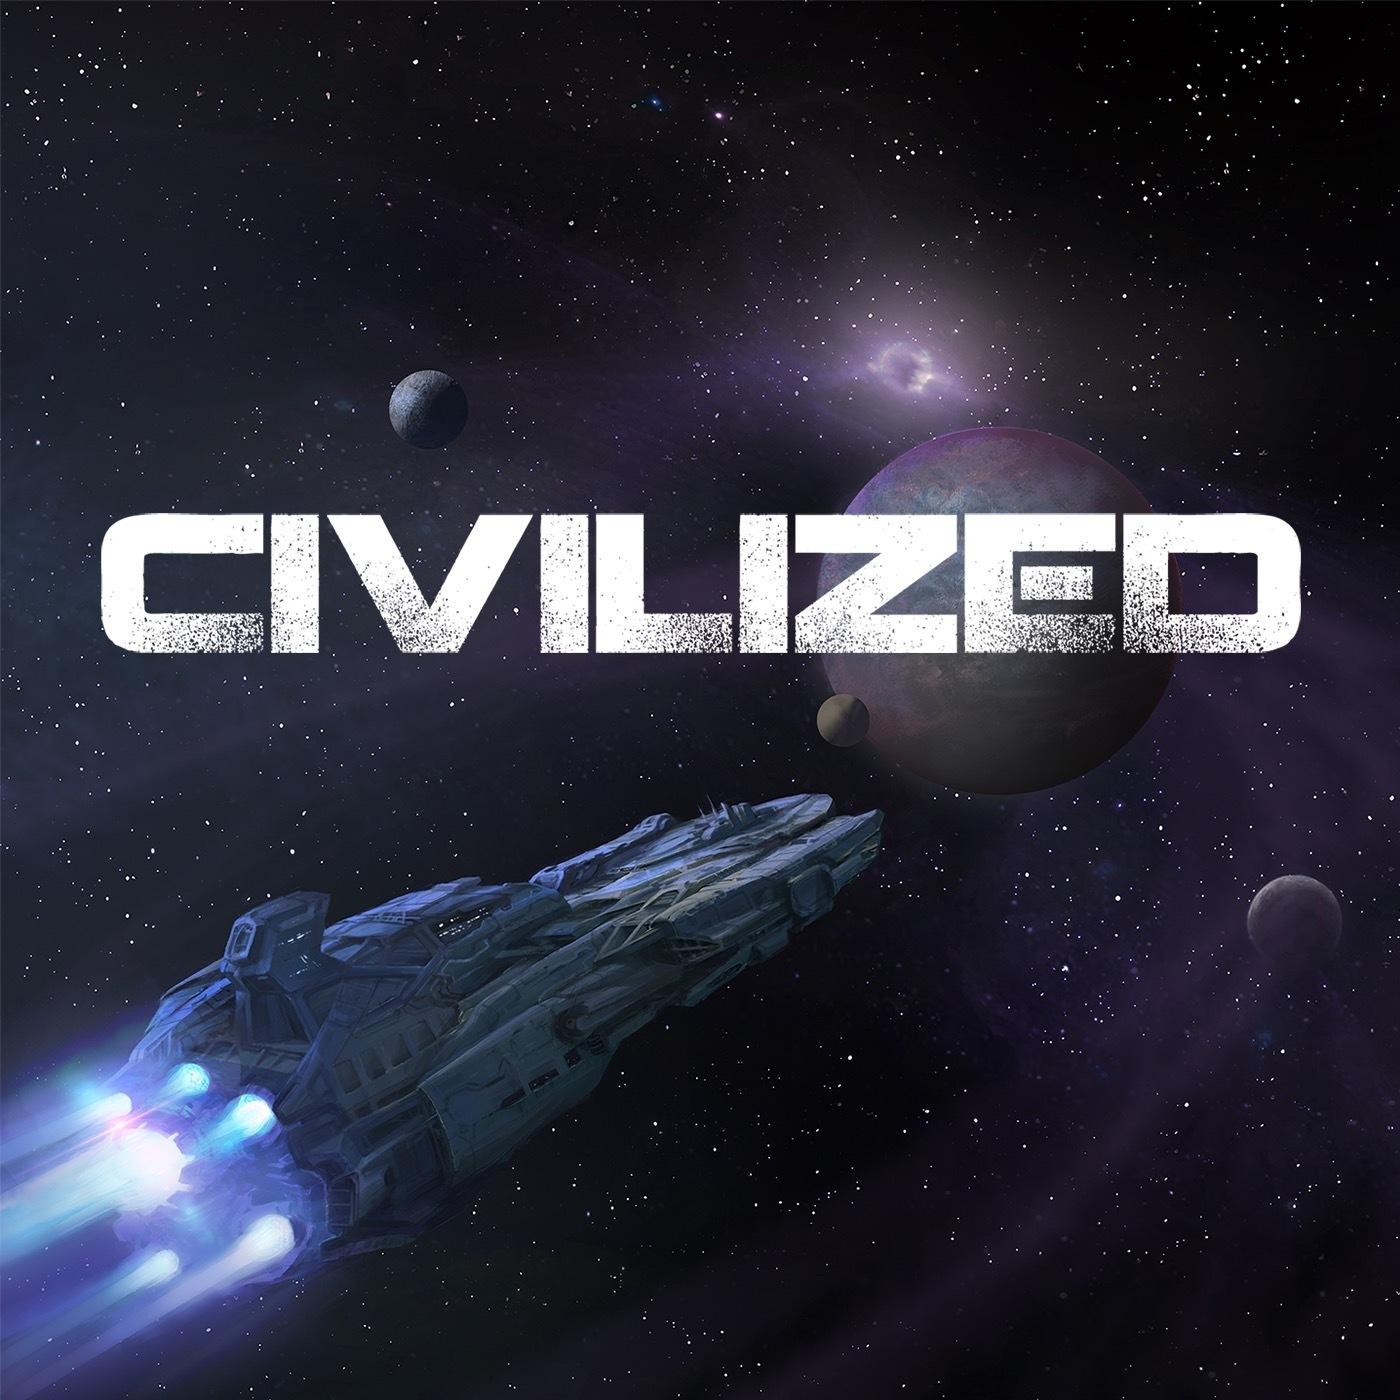 Our newest show: Civilized!